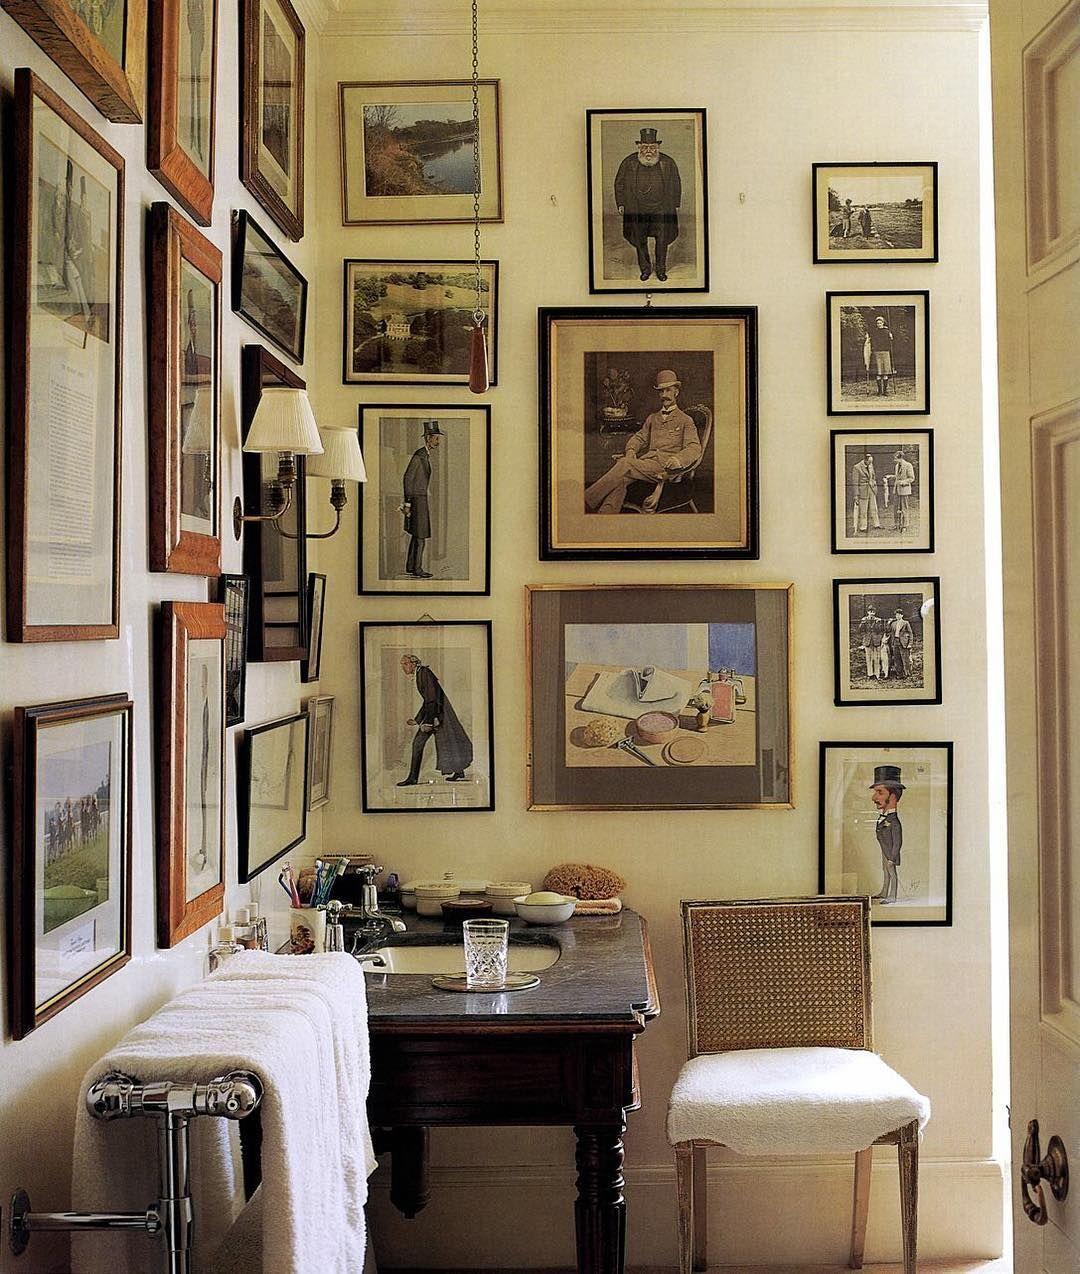 #interieur #decorazioni #decor #deco #decorate #decorate #decoração  #decoración. Living Room Gallery WallCountry House ...